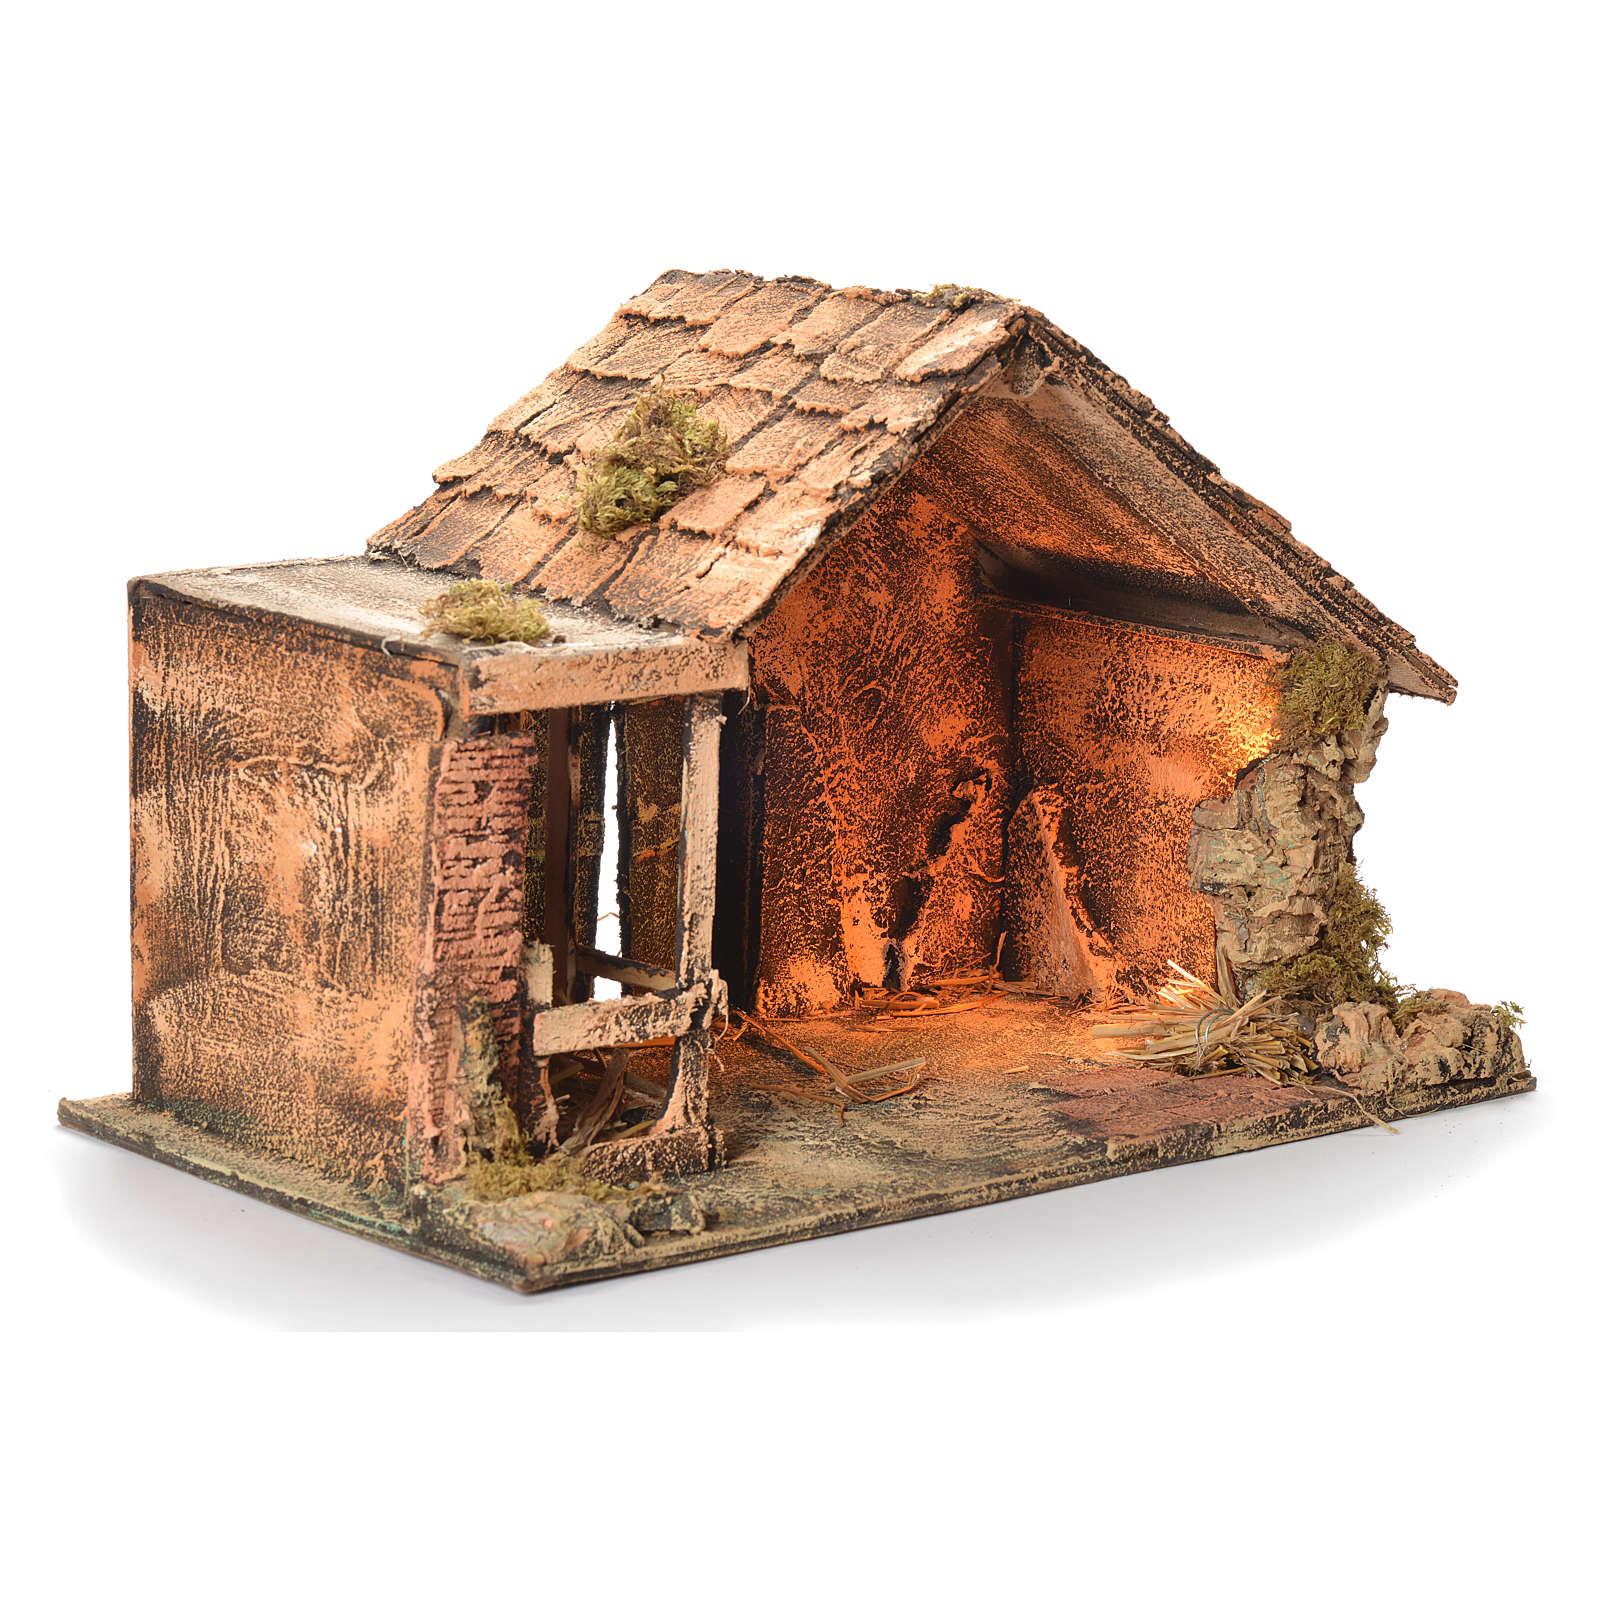 Wooden and straw cabin, Neapolitan Nativity 31x46x29cm 4